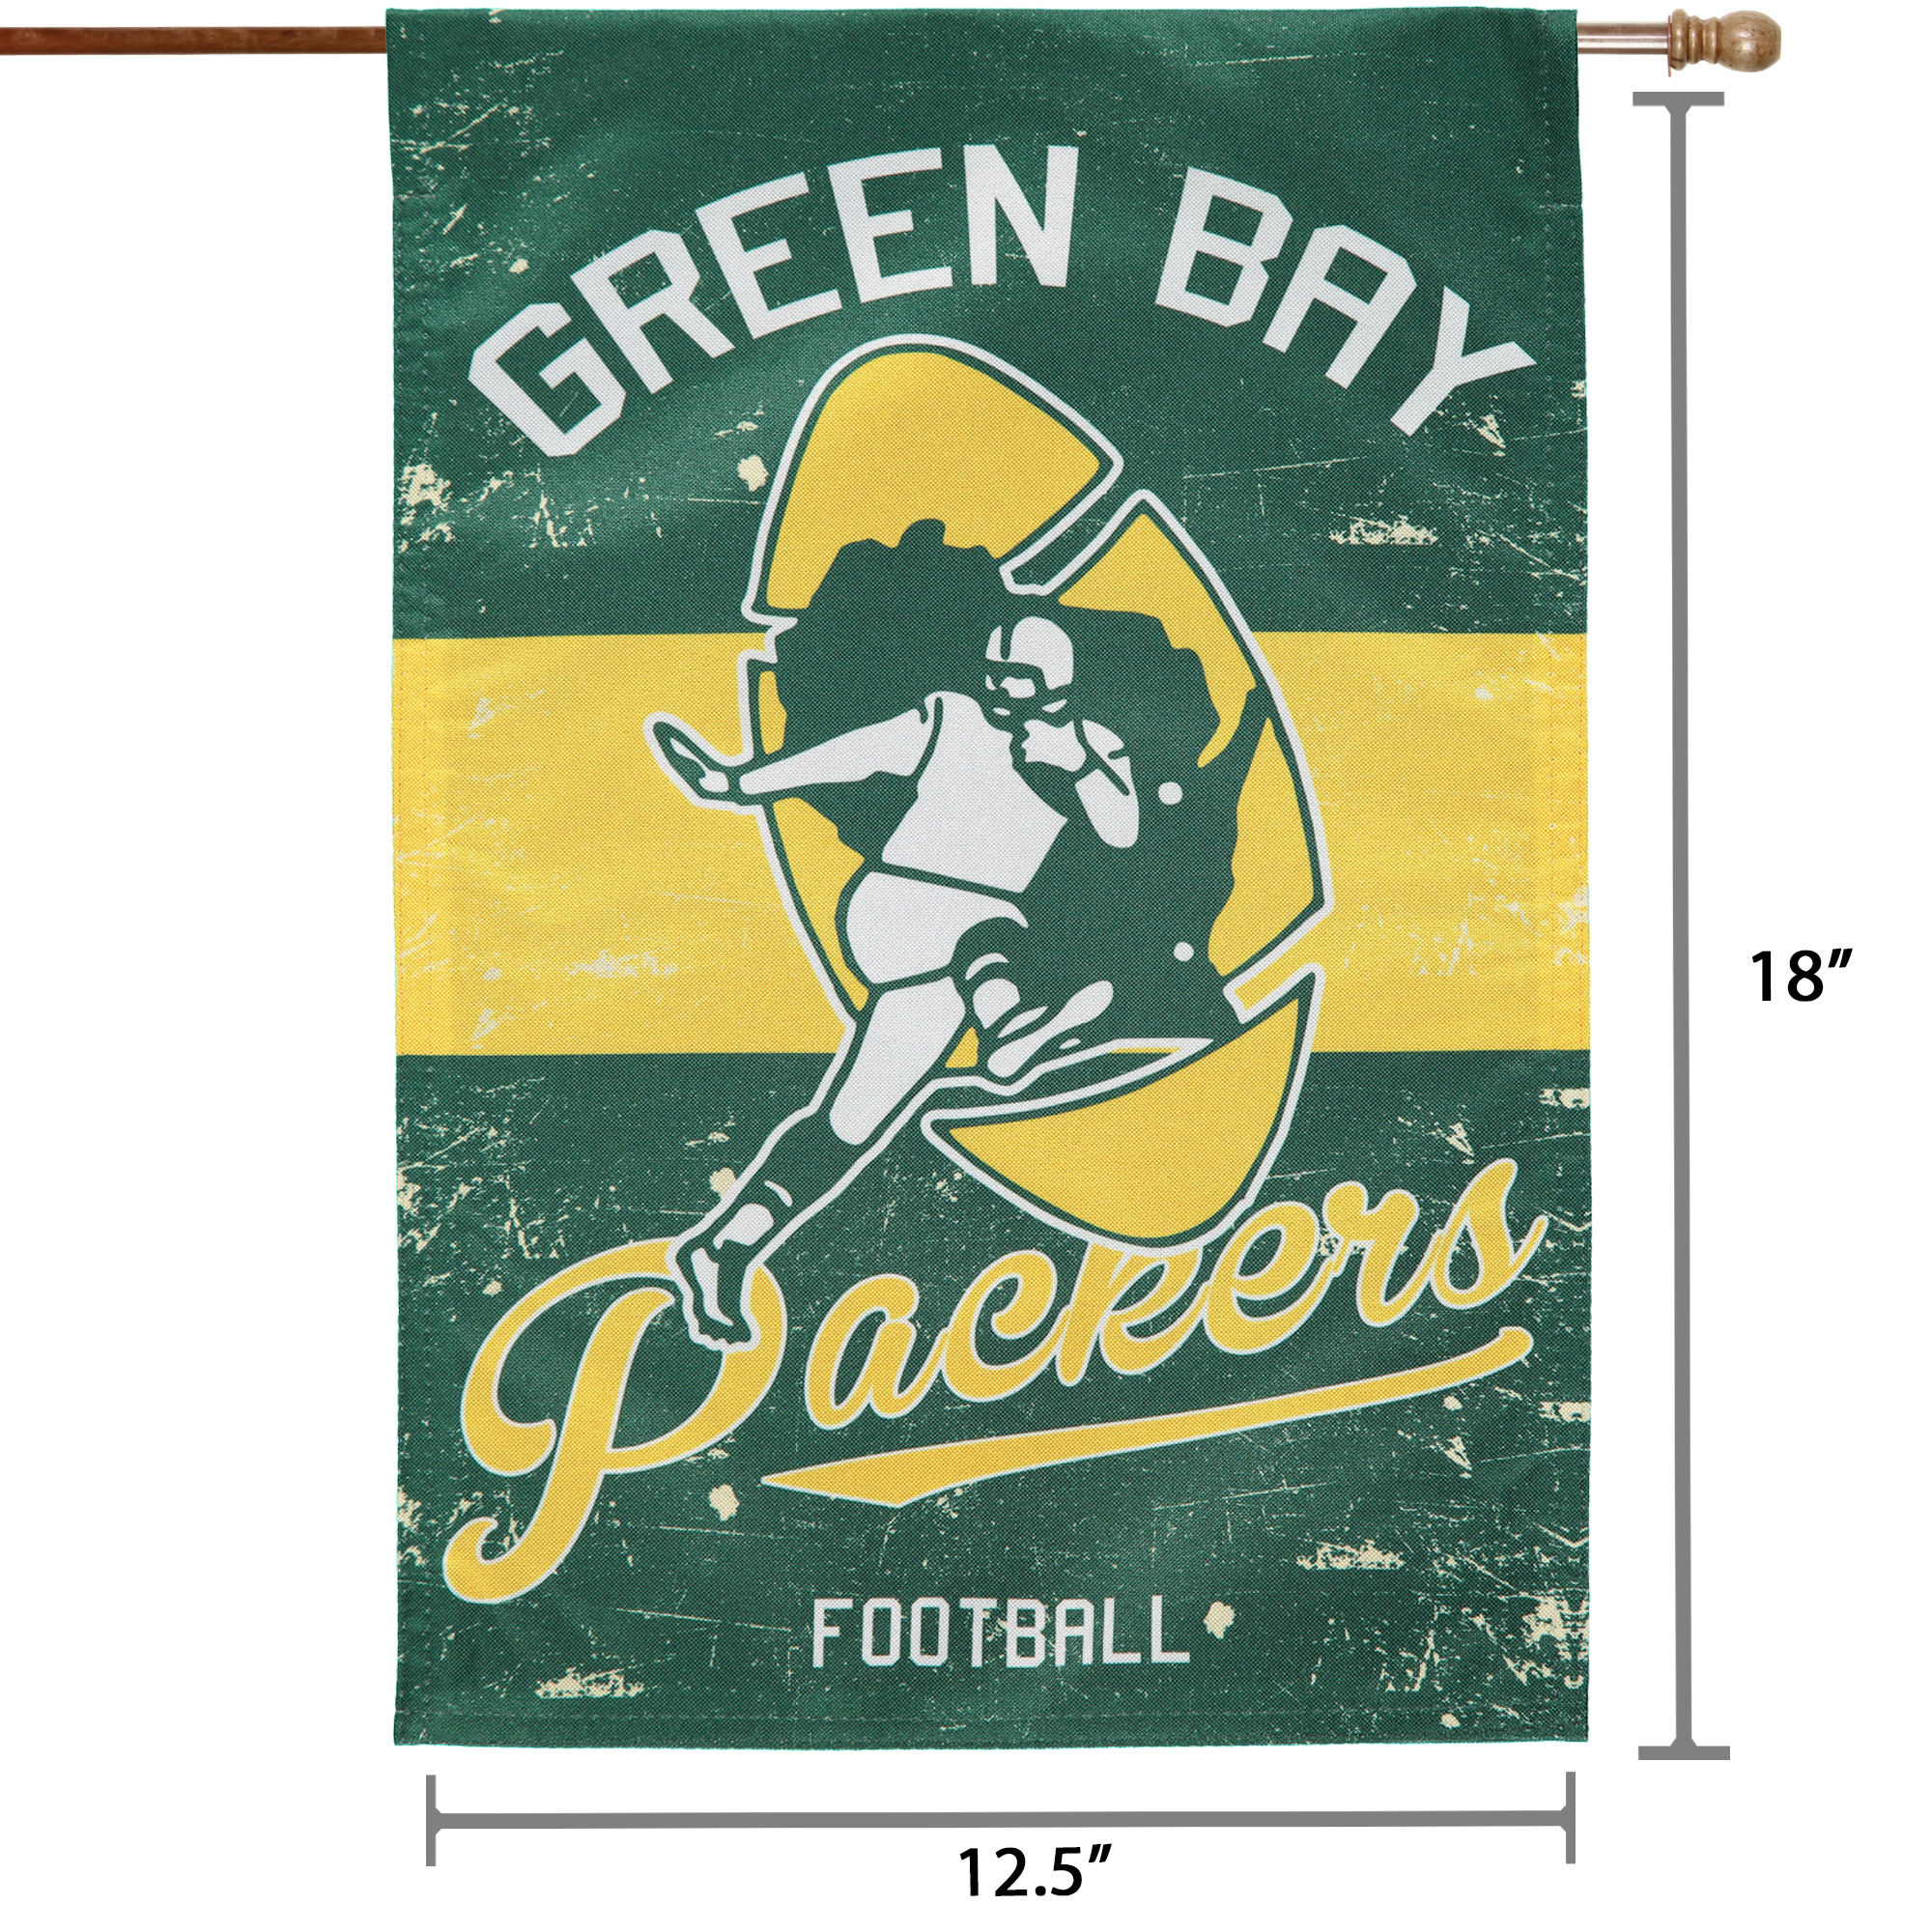 Green Bay Packers Trashcan trash can kitchen laundry shabby  football